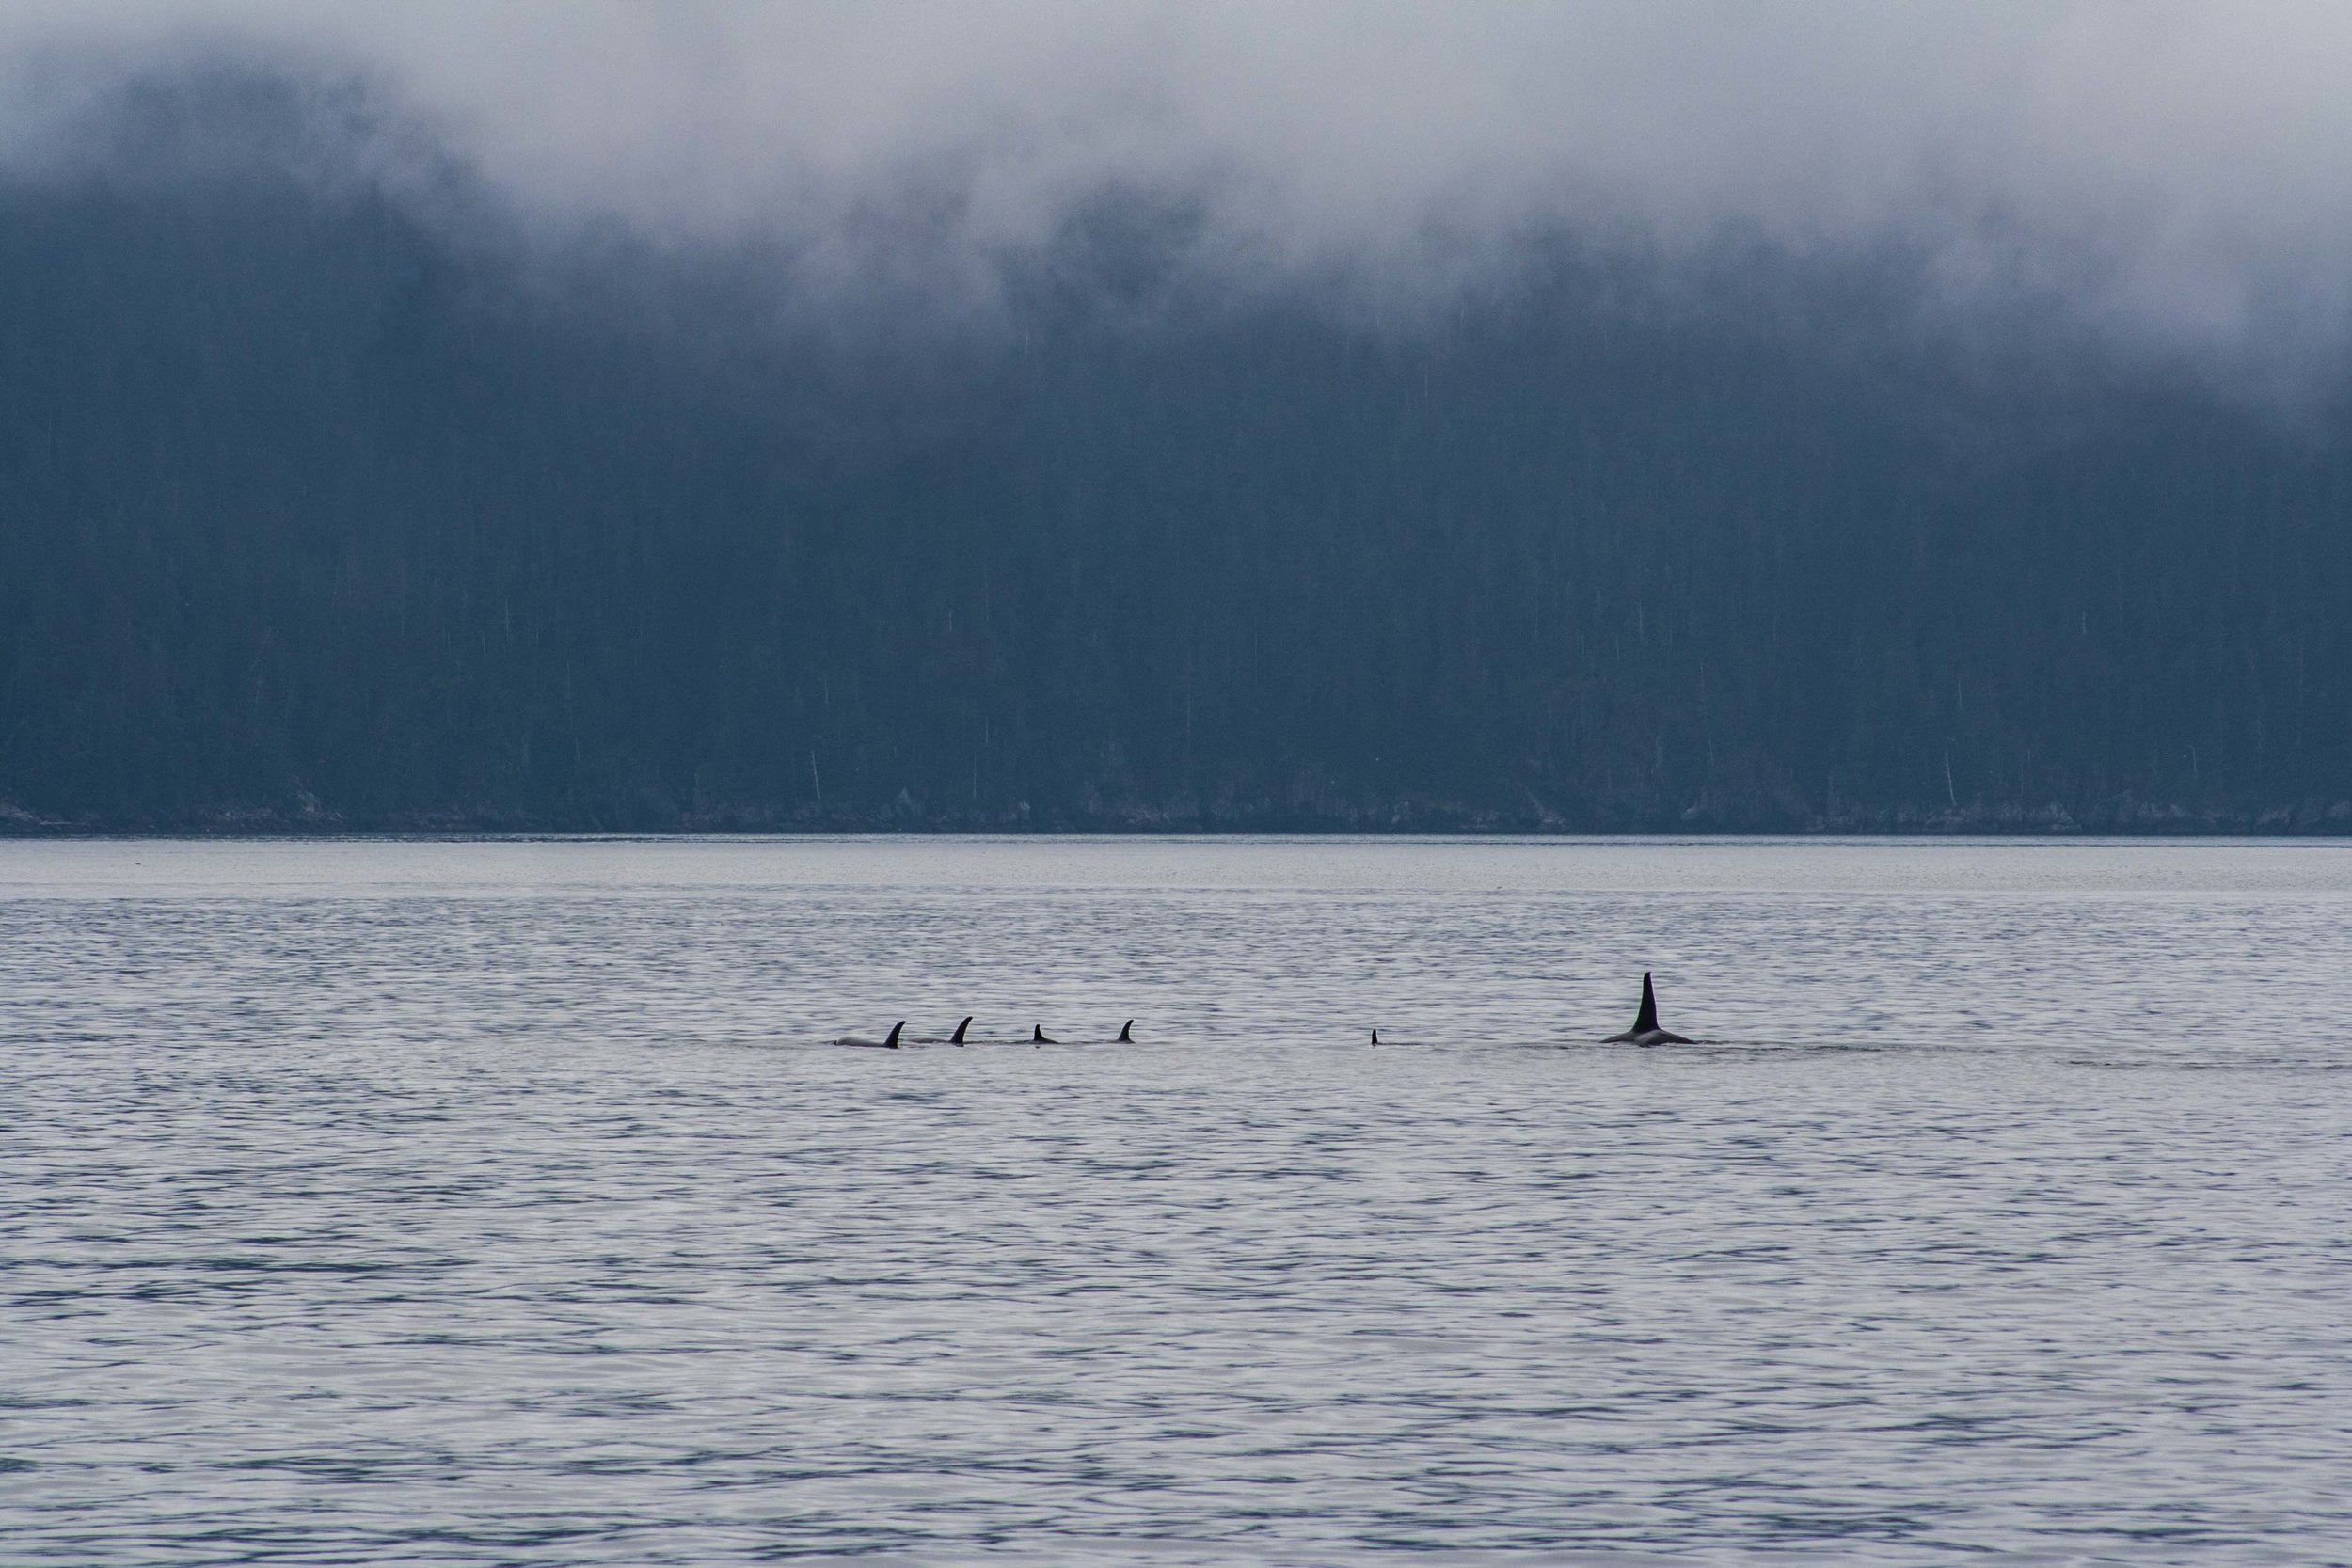 Kenai Fjords National Park, Alaska. August 2014